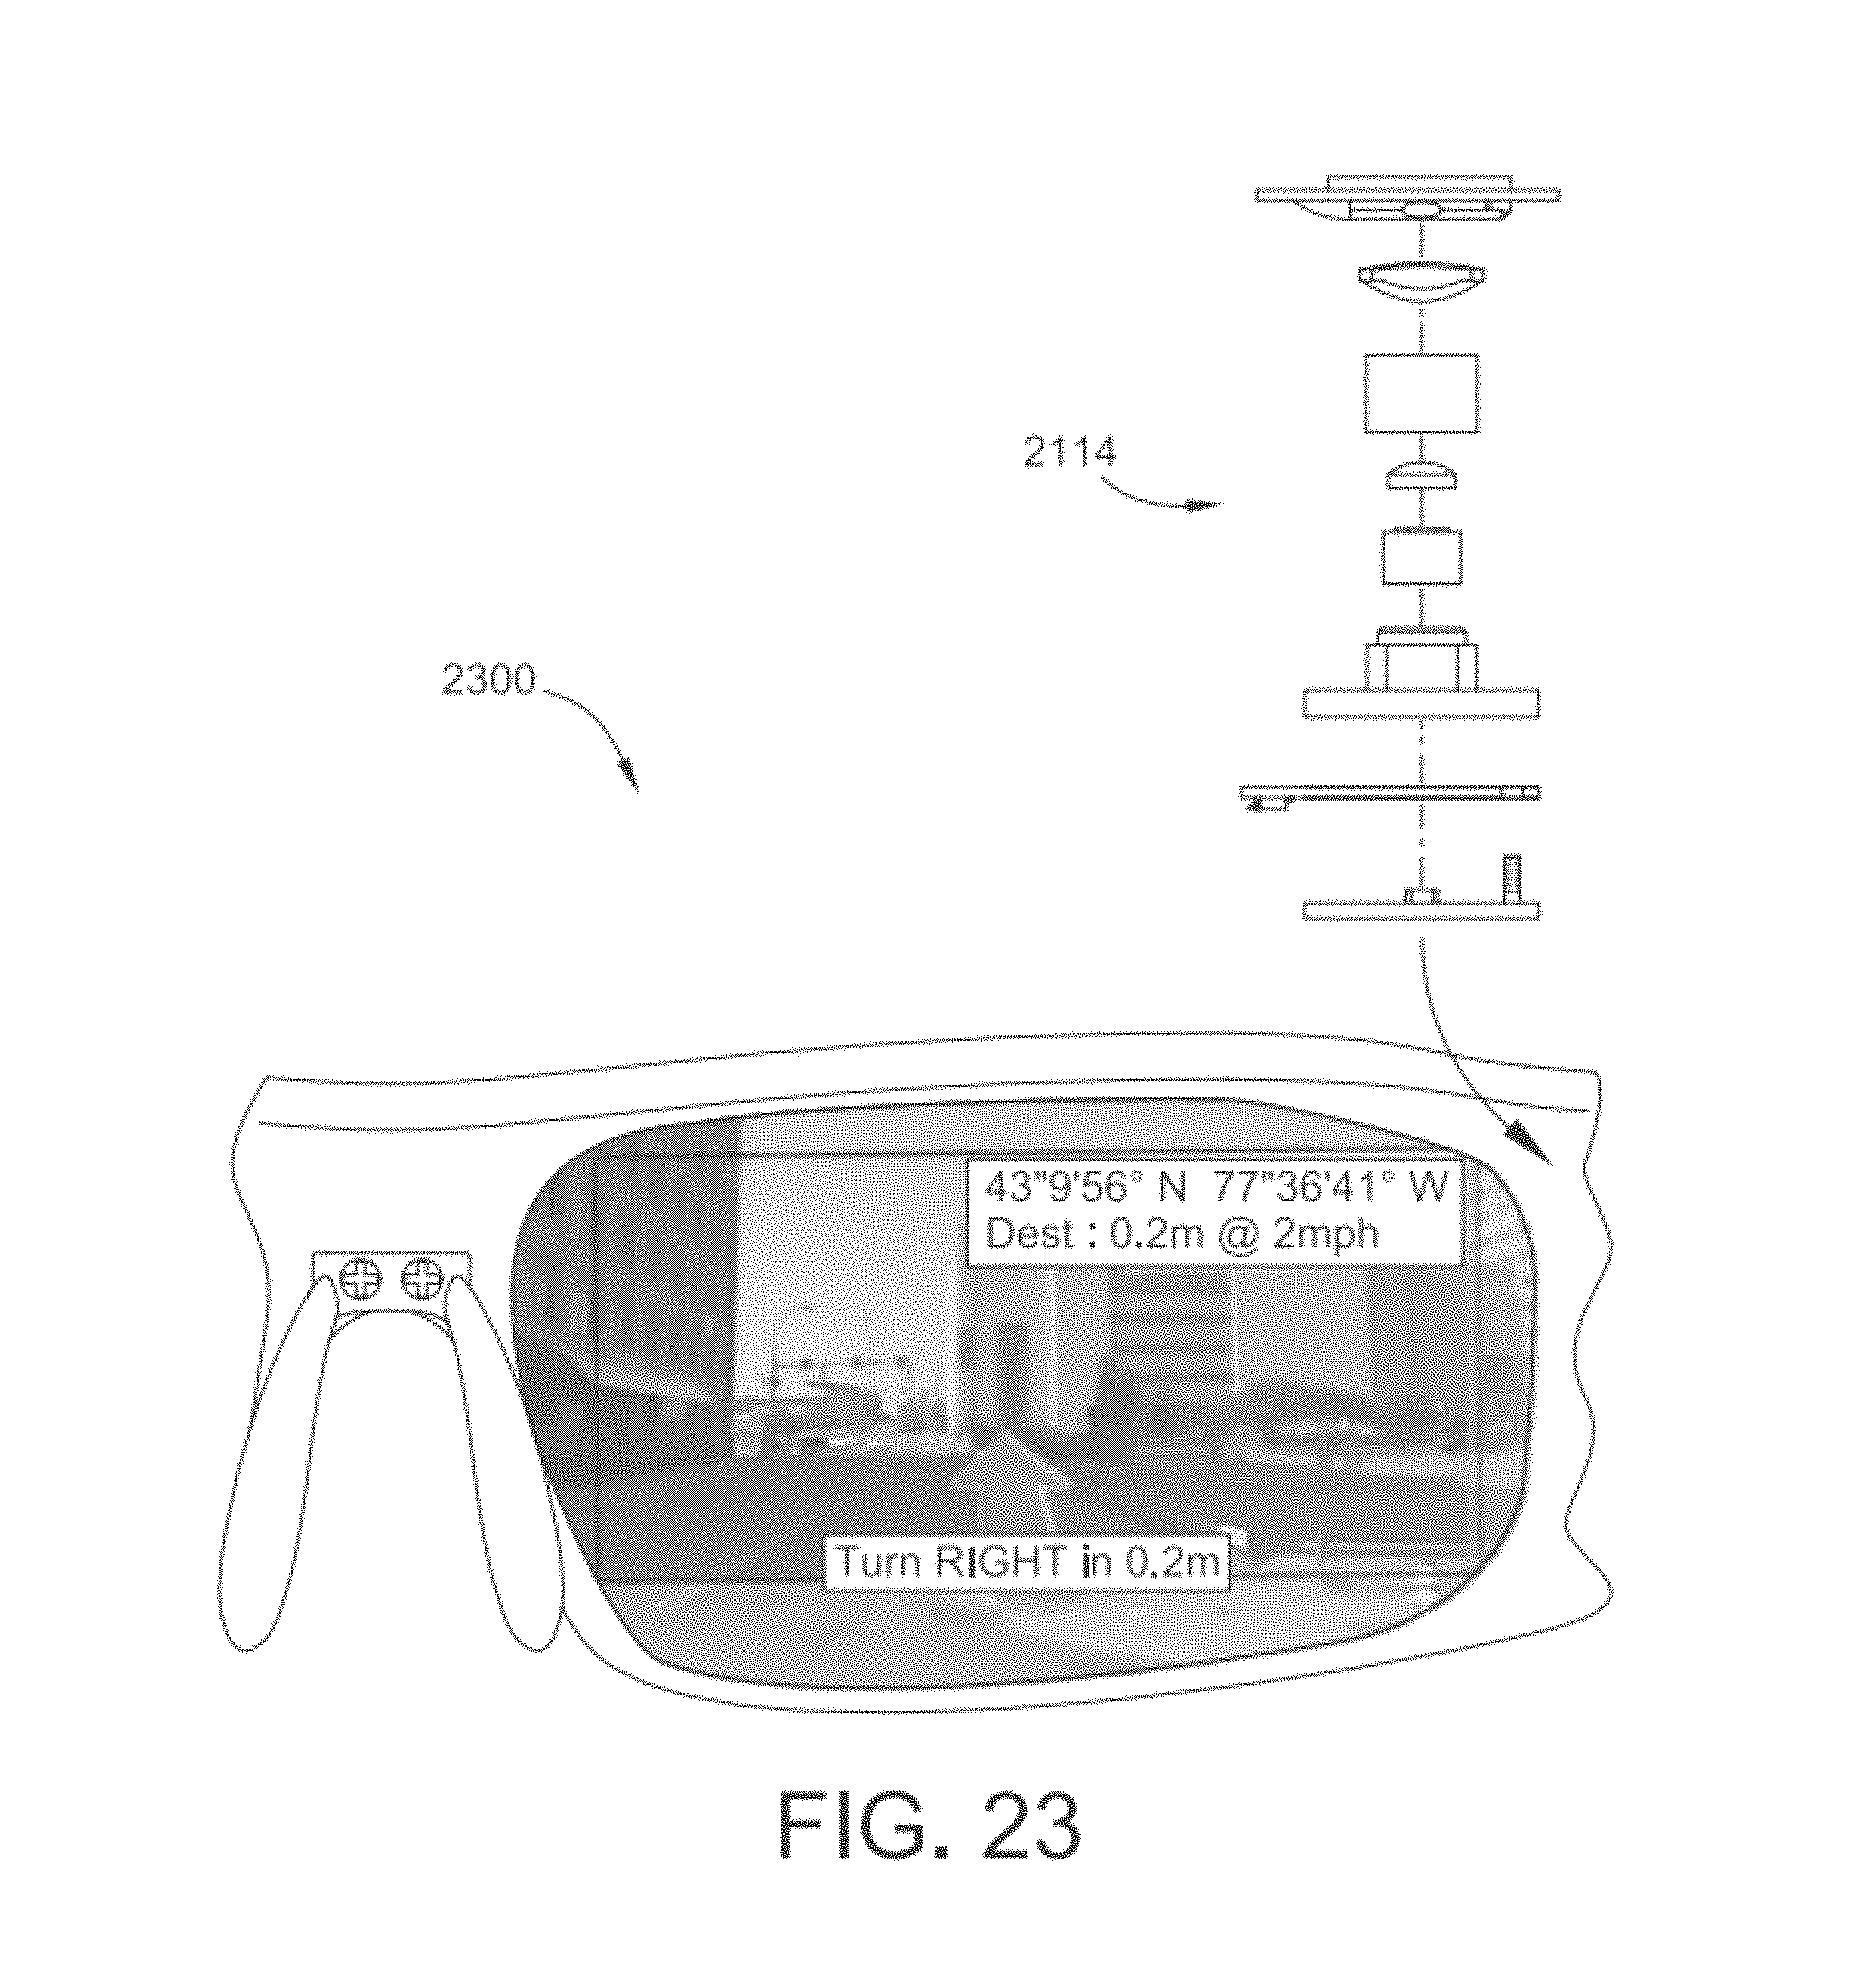 dda94bb4f79 ... Patent images ...